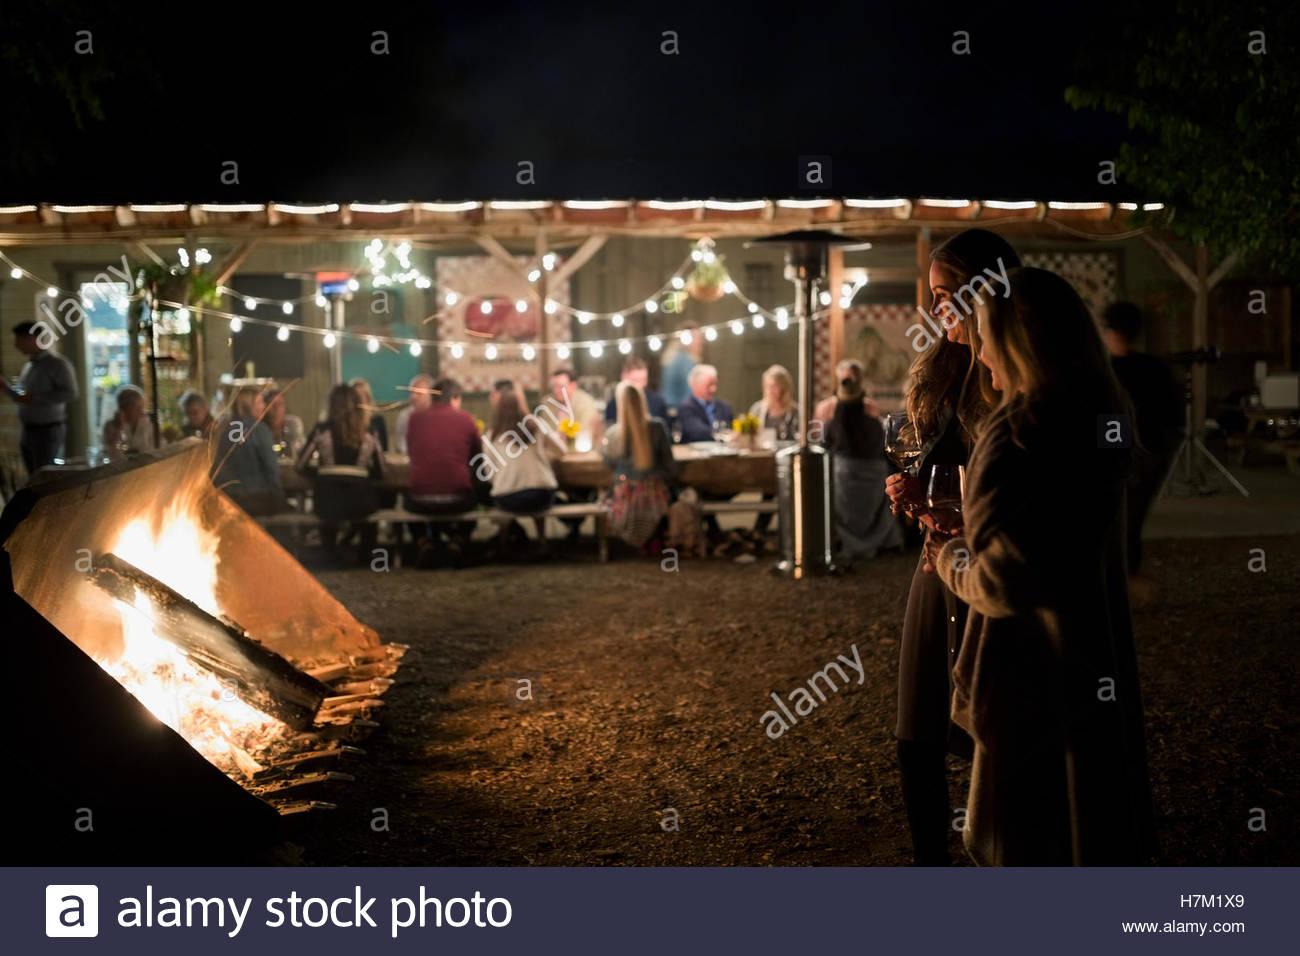 Friends enjoying bonfire and string lights illuminating outdoor dinner party - Stock Image